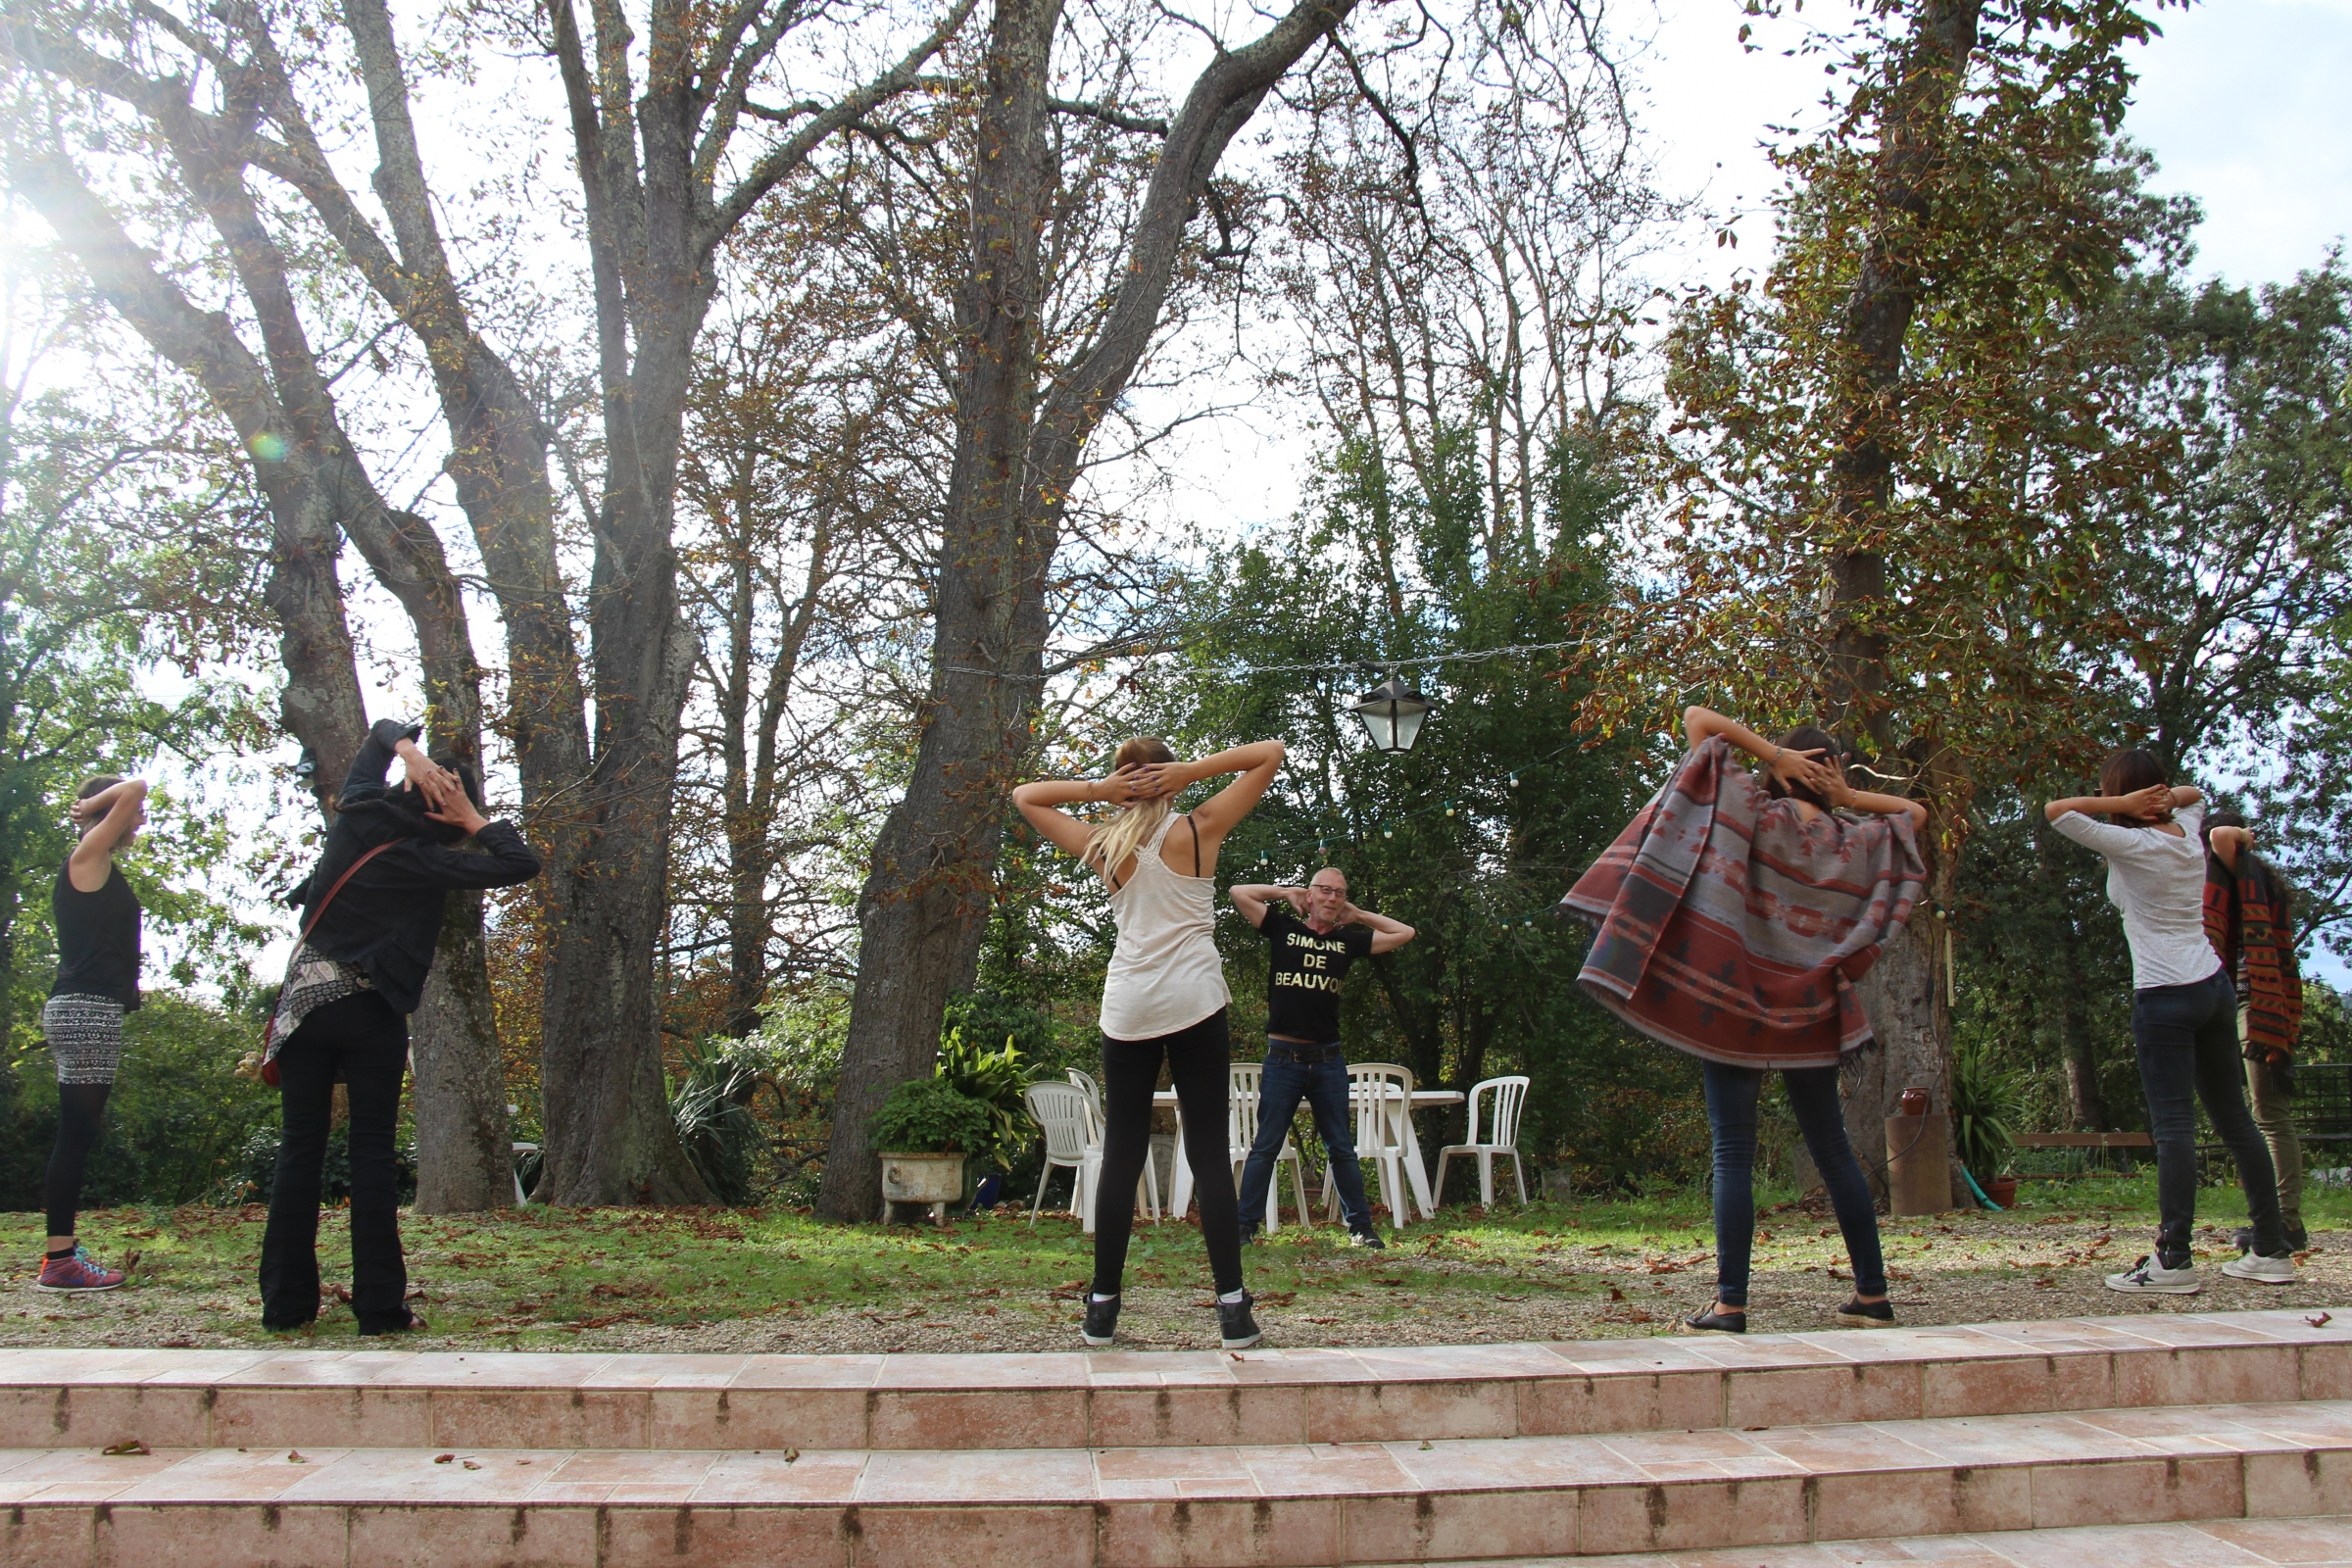 pascal-lievre-afiac-maison-feministe-2015-011